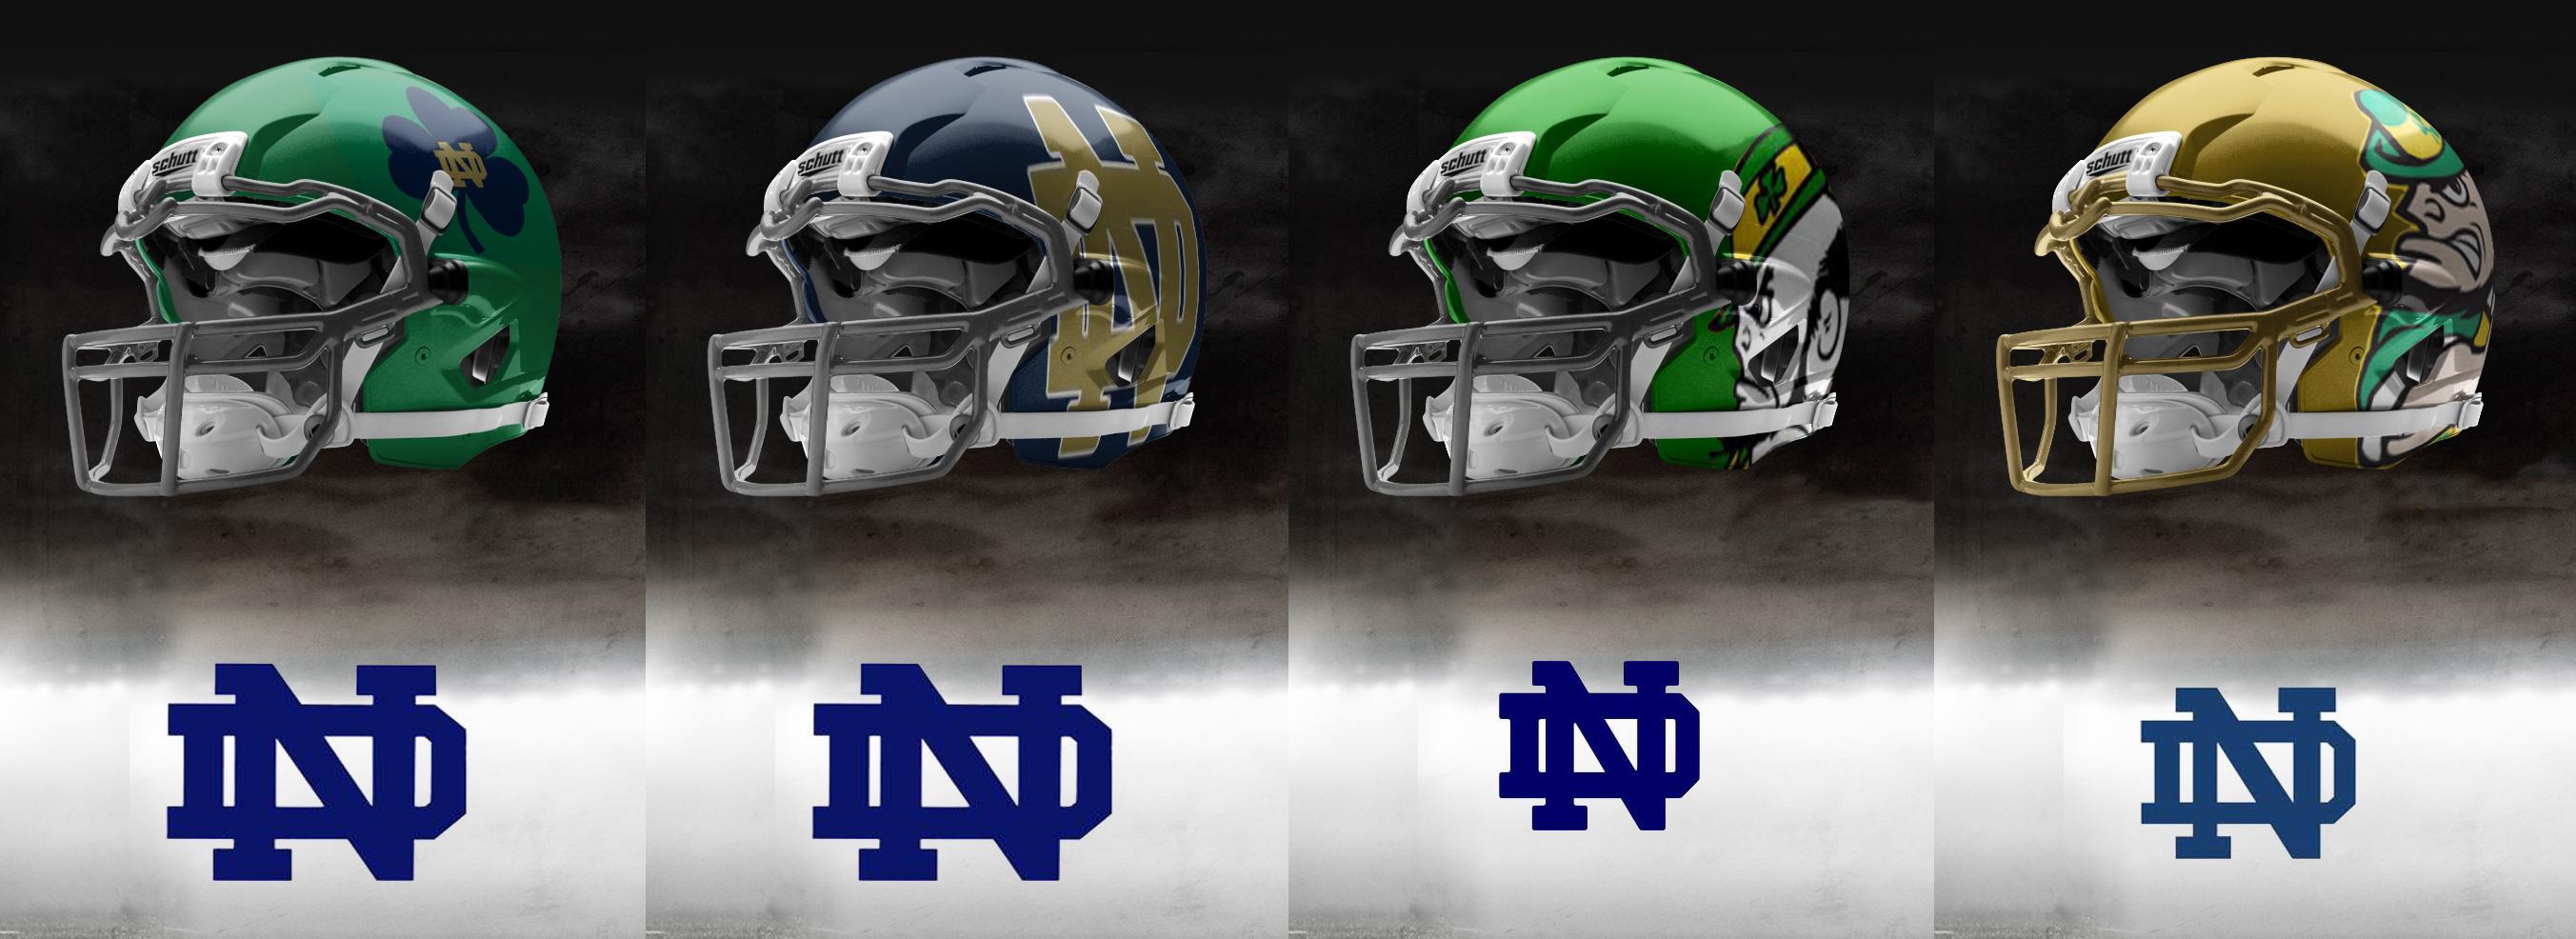 Helmets Png 2 705 986 Pixels Irish Fans Fighting Irish Notre Dame Fighting Irish